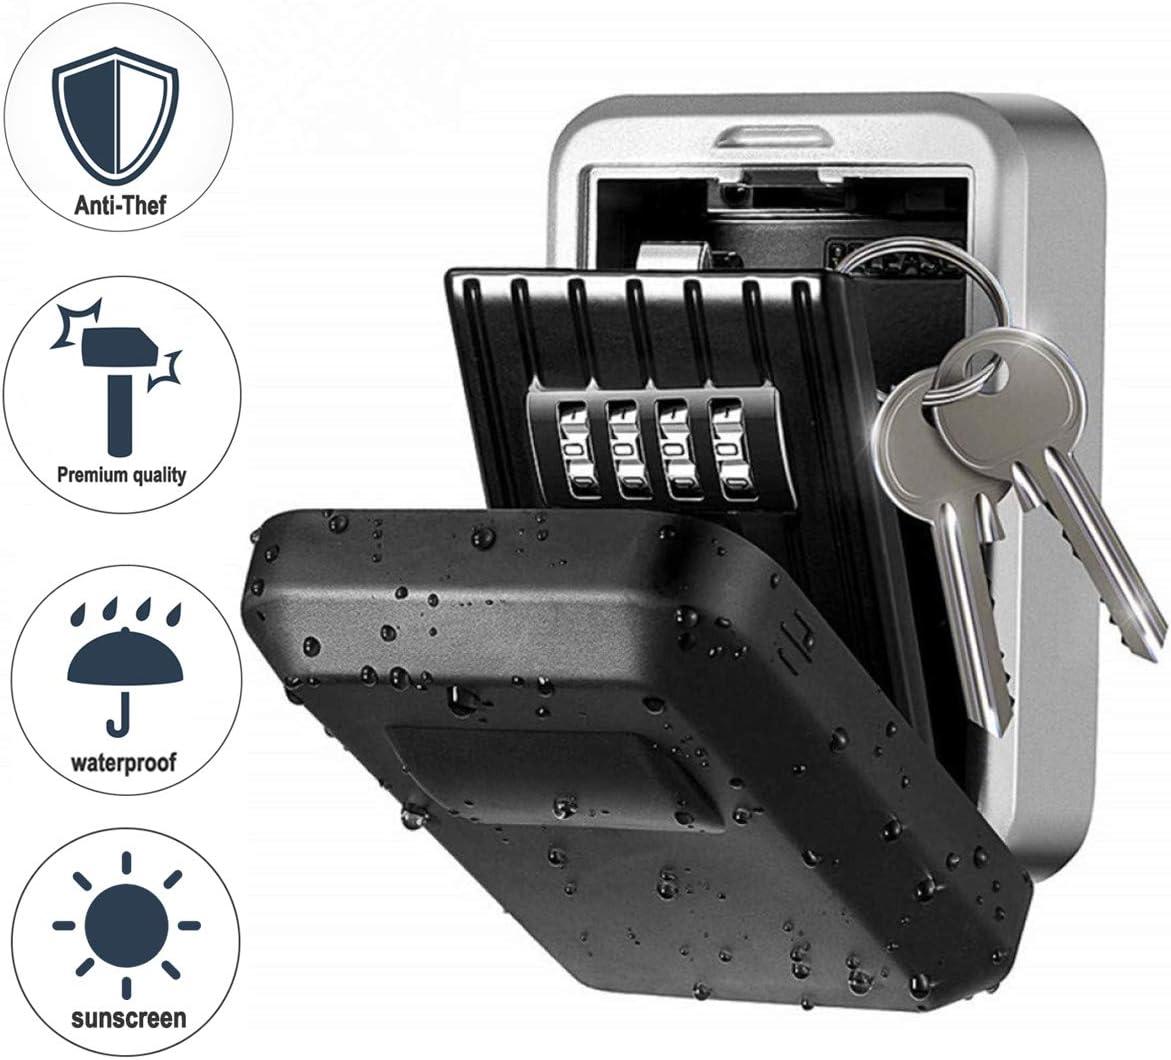 Schlüsselsafe Schlüsseltresor Schlüsselbox Keysafe Zahlenschloss OW 09